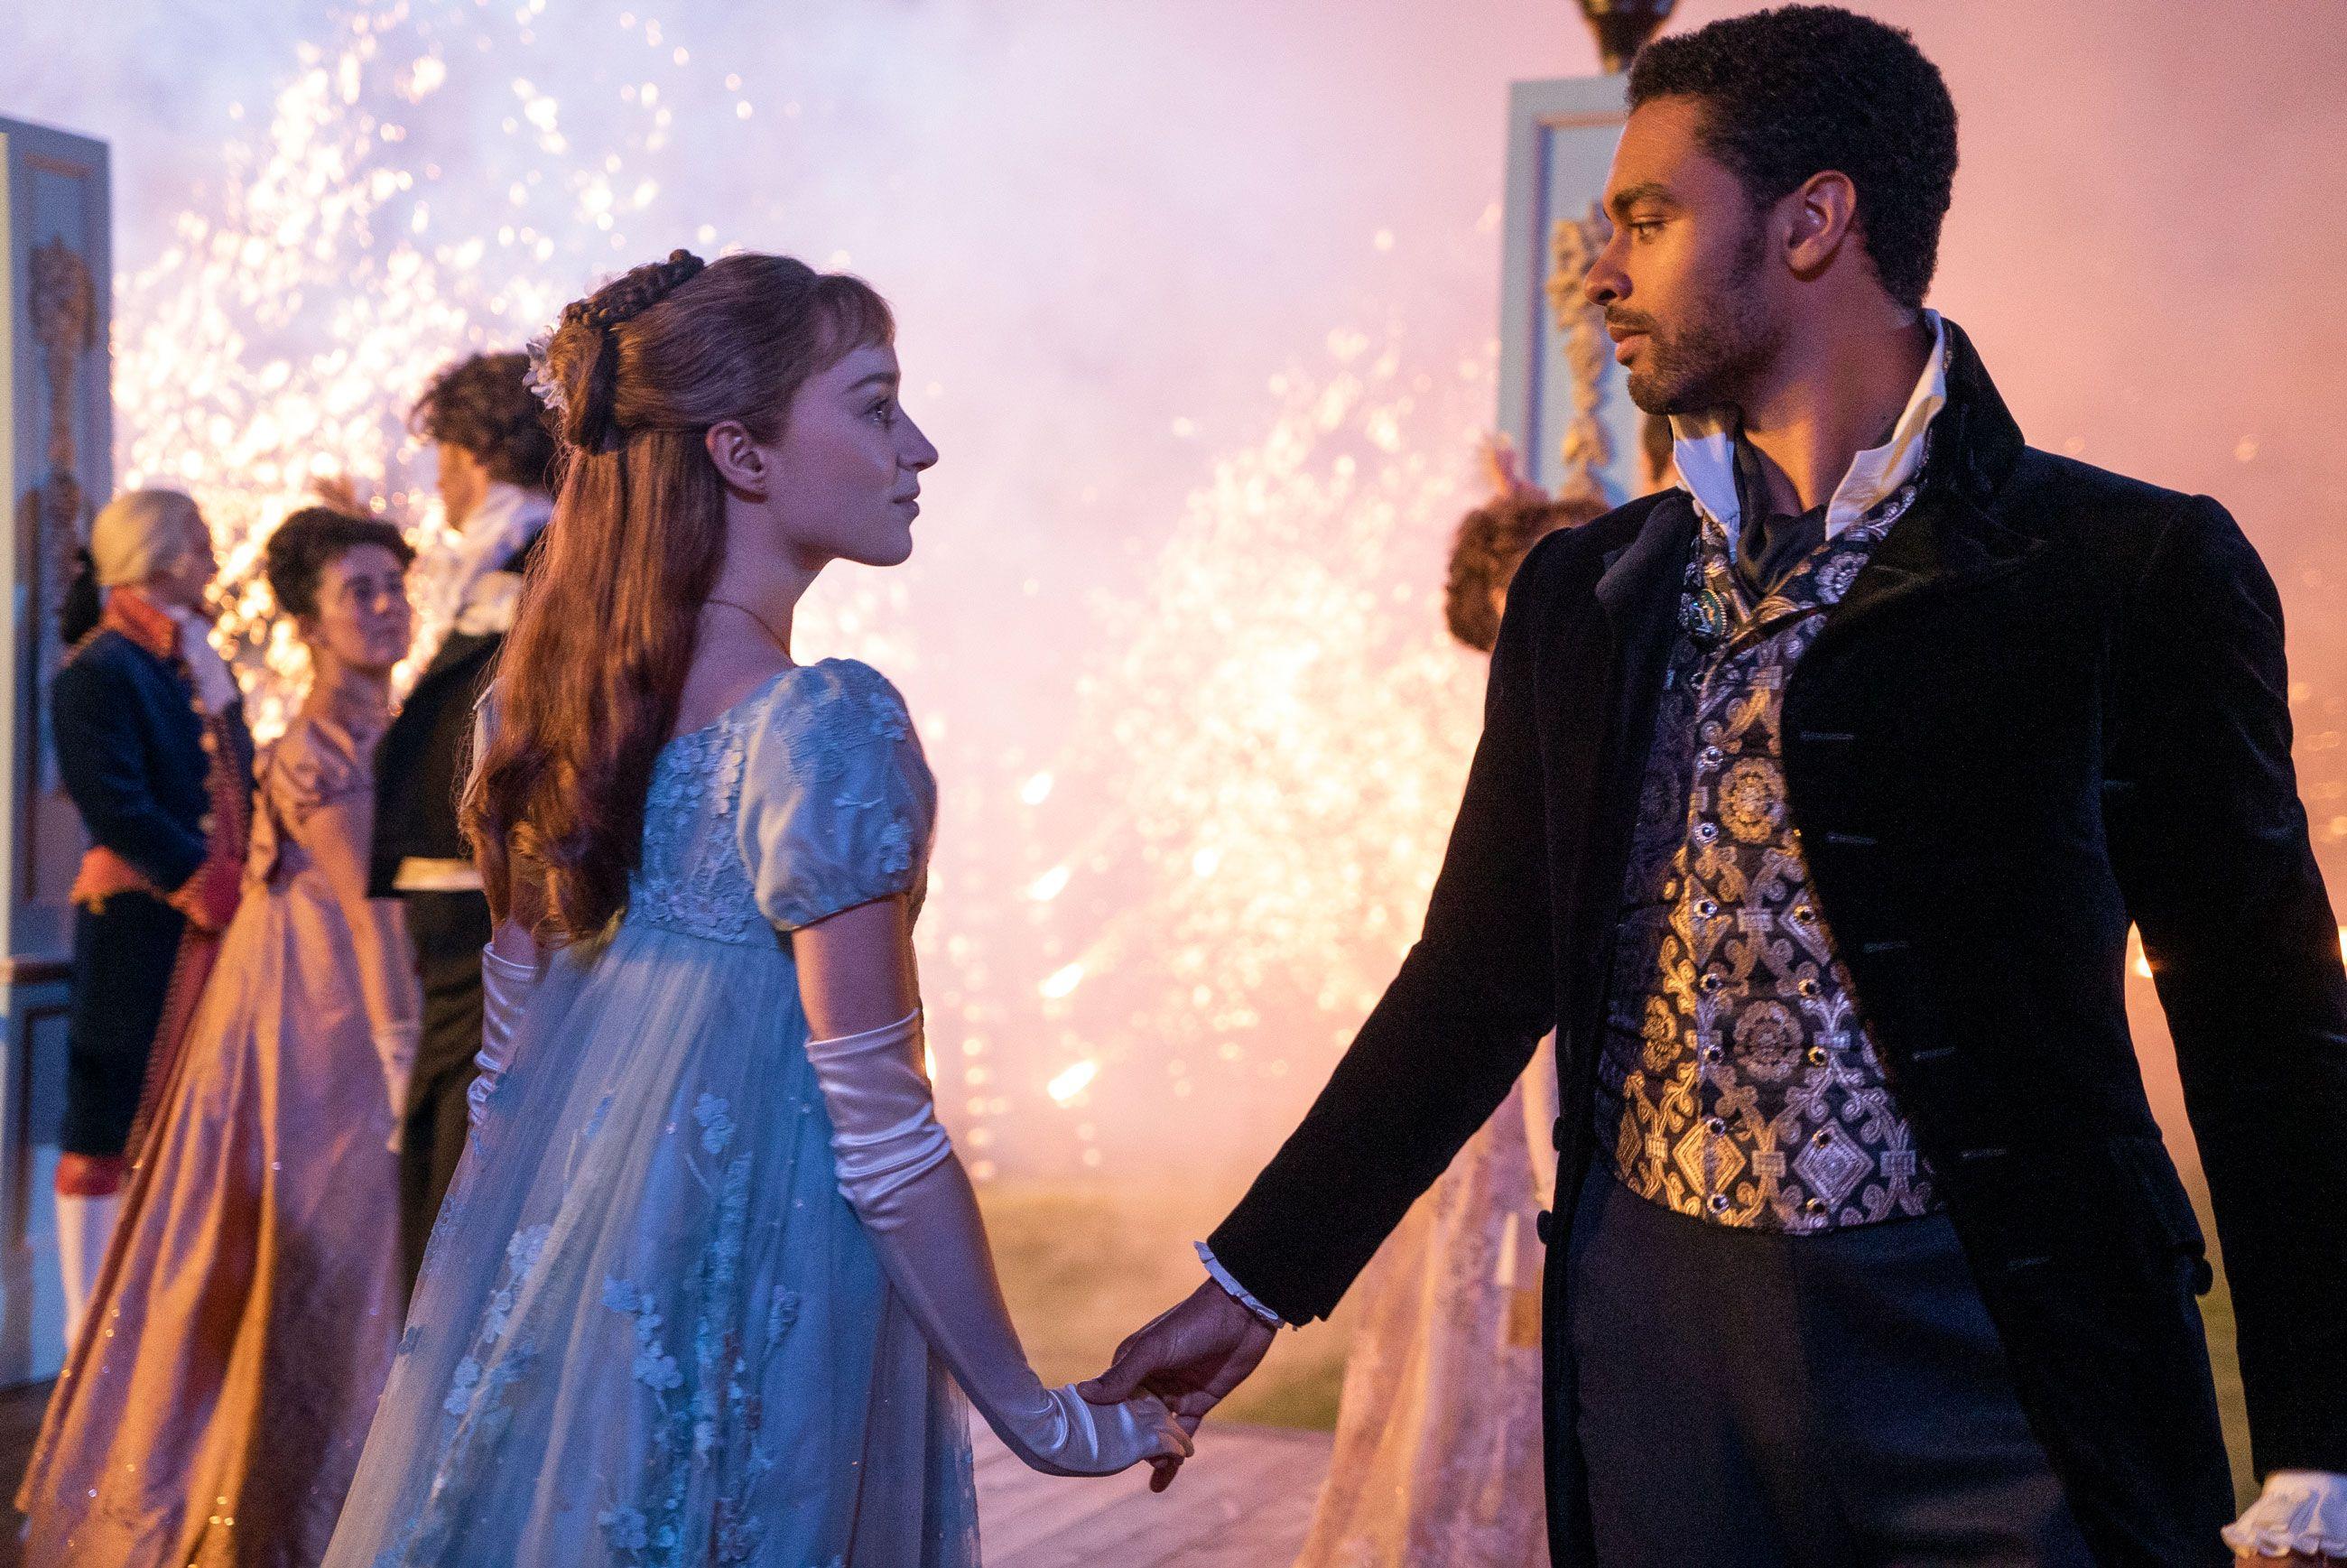 Julia Quinn's Bridgerton Series Is Heading to Netflix - The Bridgertons News, Casting, Premiere Date